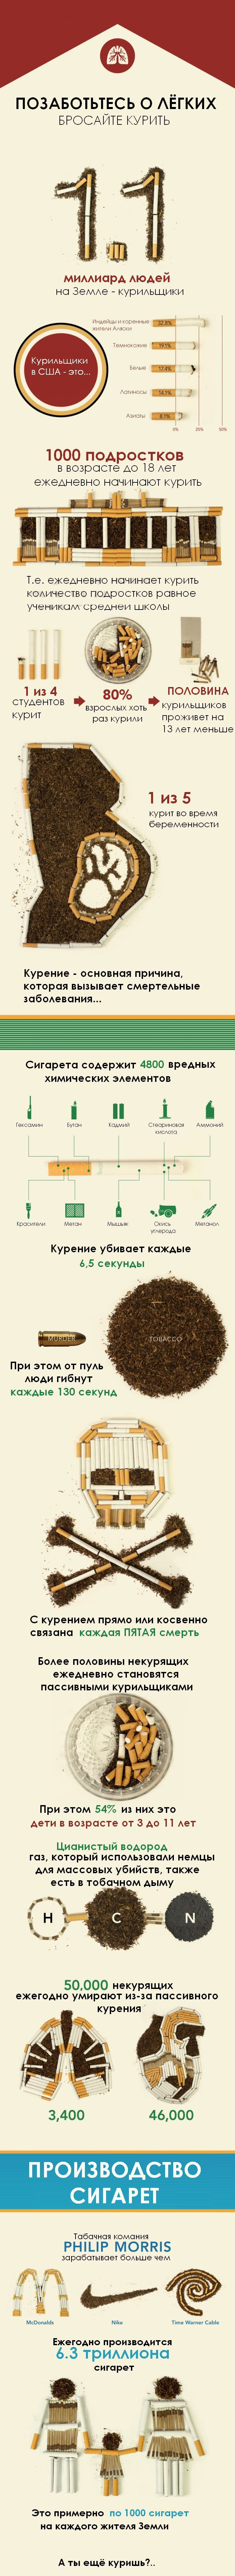 Вы еще курите? (1 картинка)